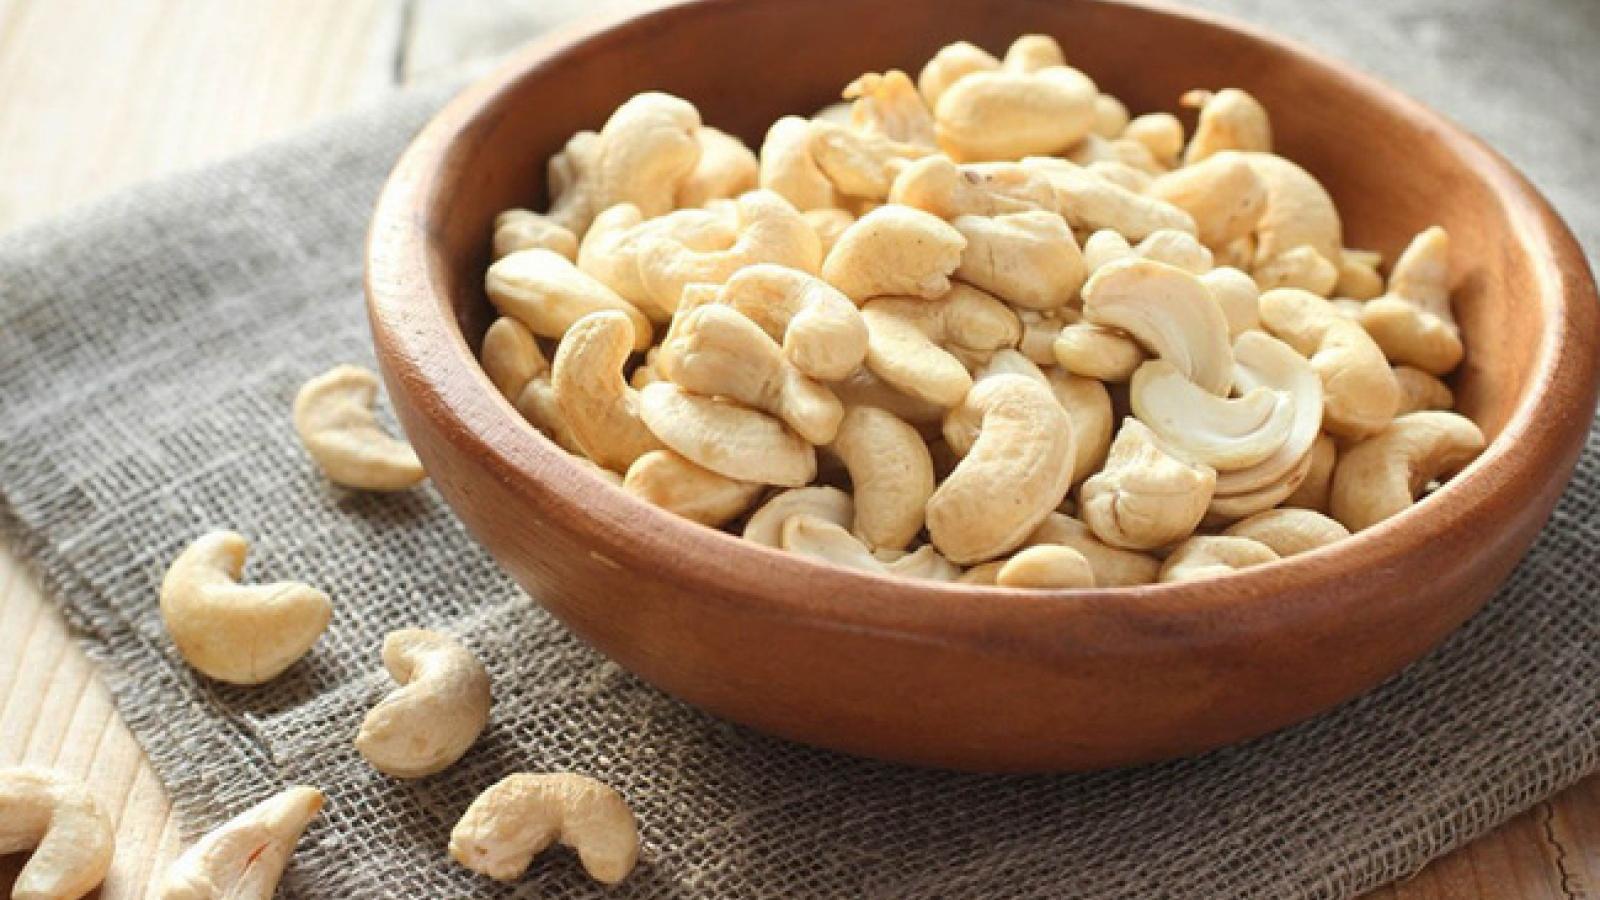 Switzerland increases import of Vietnamese cashew nuts